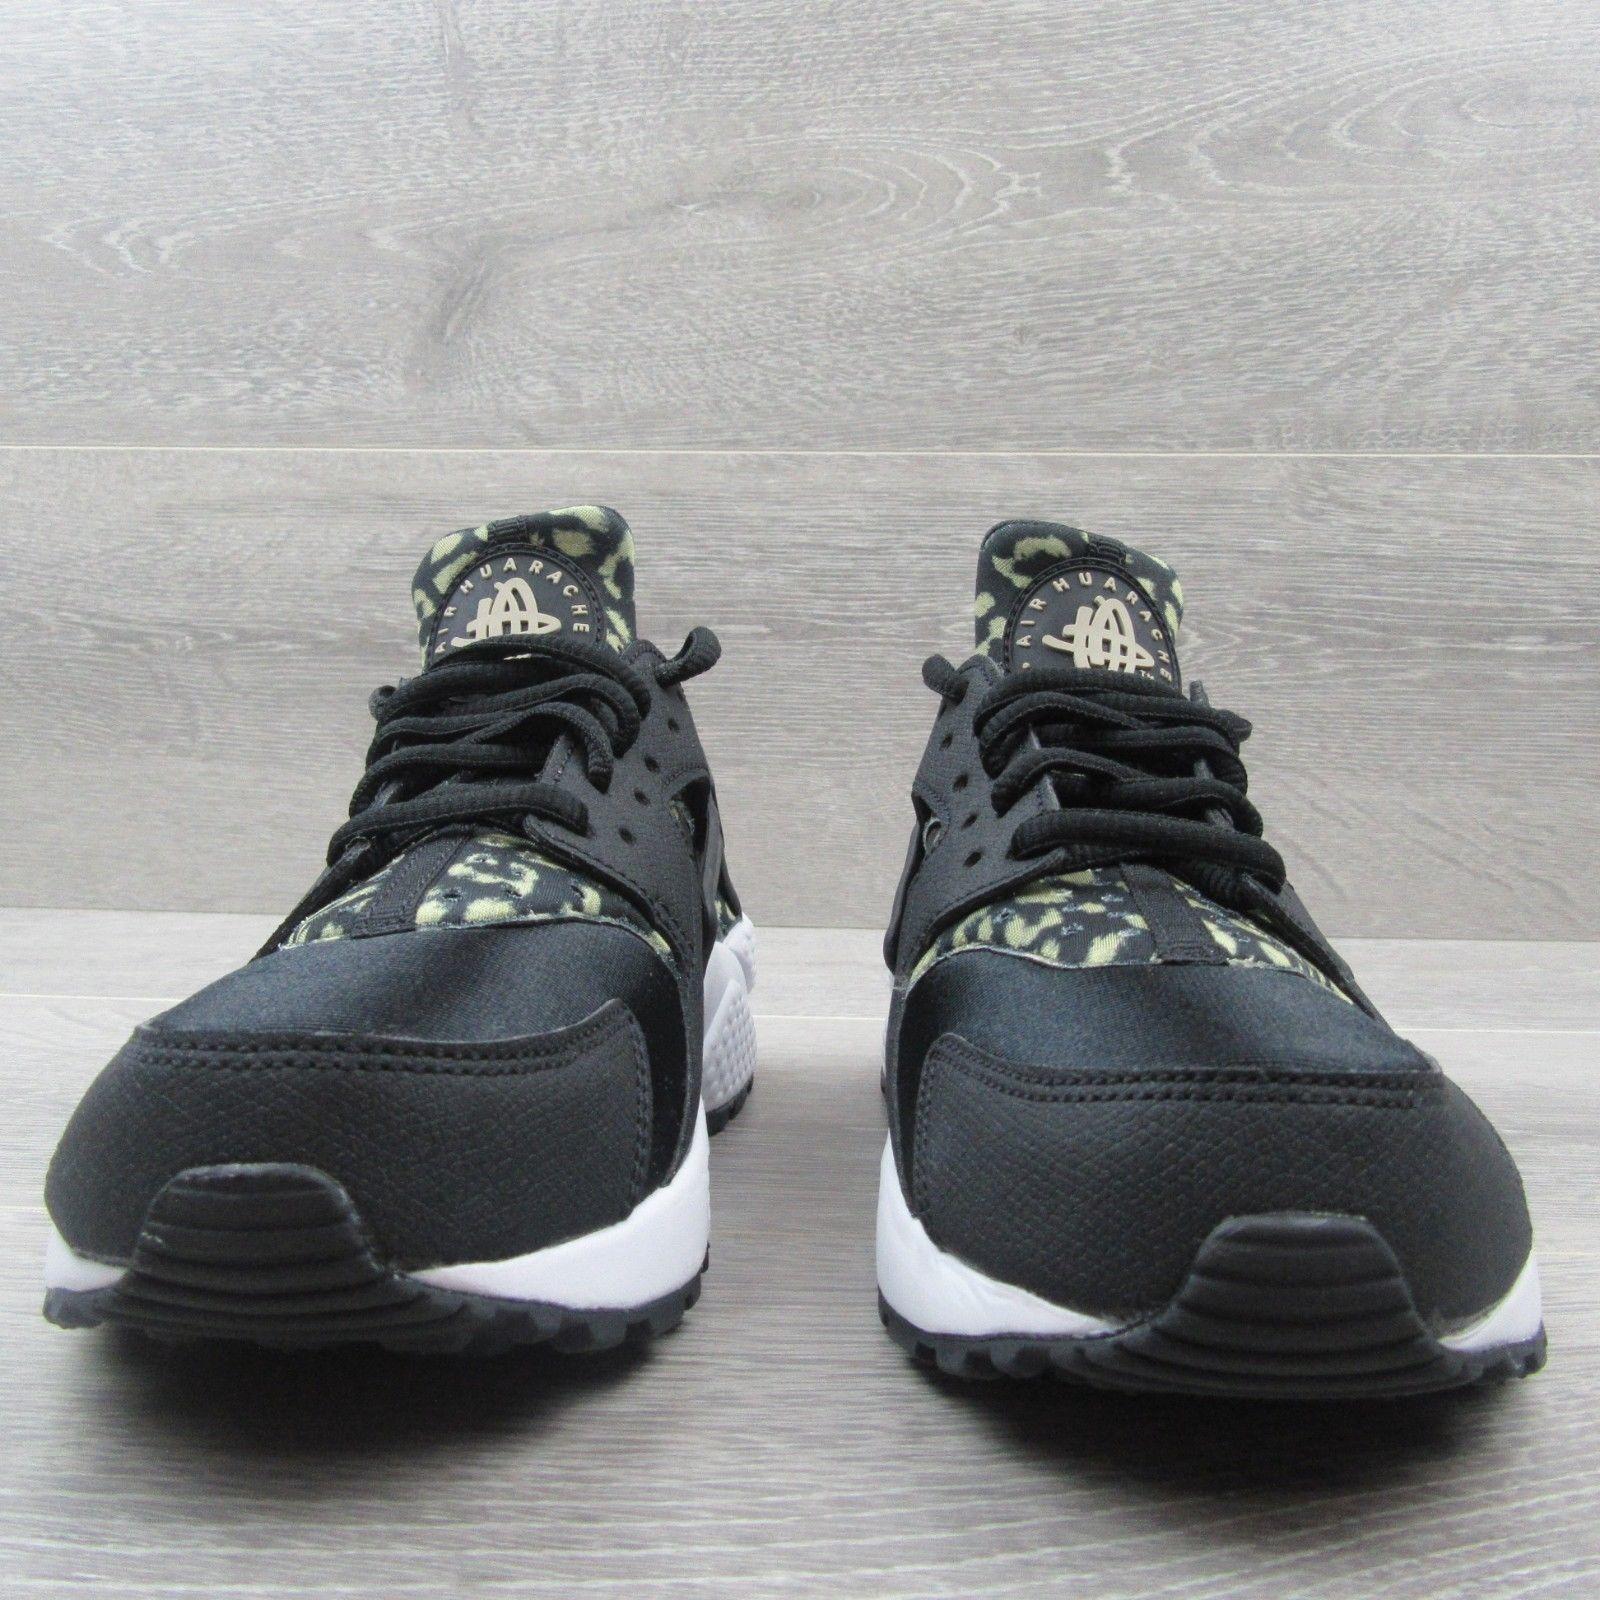 new arrival b2121 abd8d Nike Air Huarache Shoes Size 6.5 Womens Leopard Print Black Beige New 725076  007